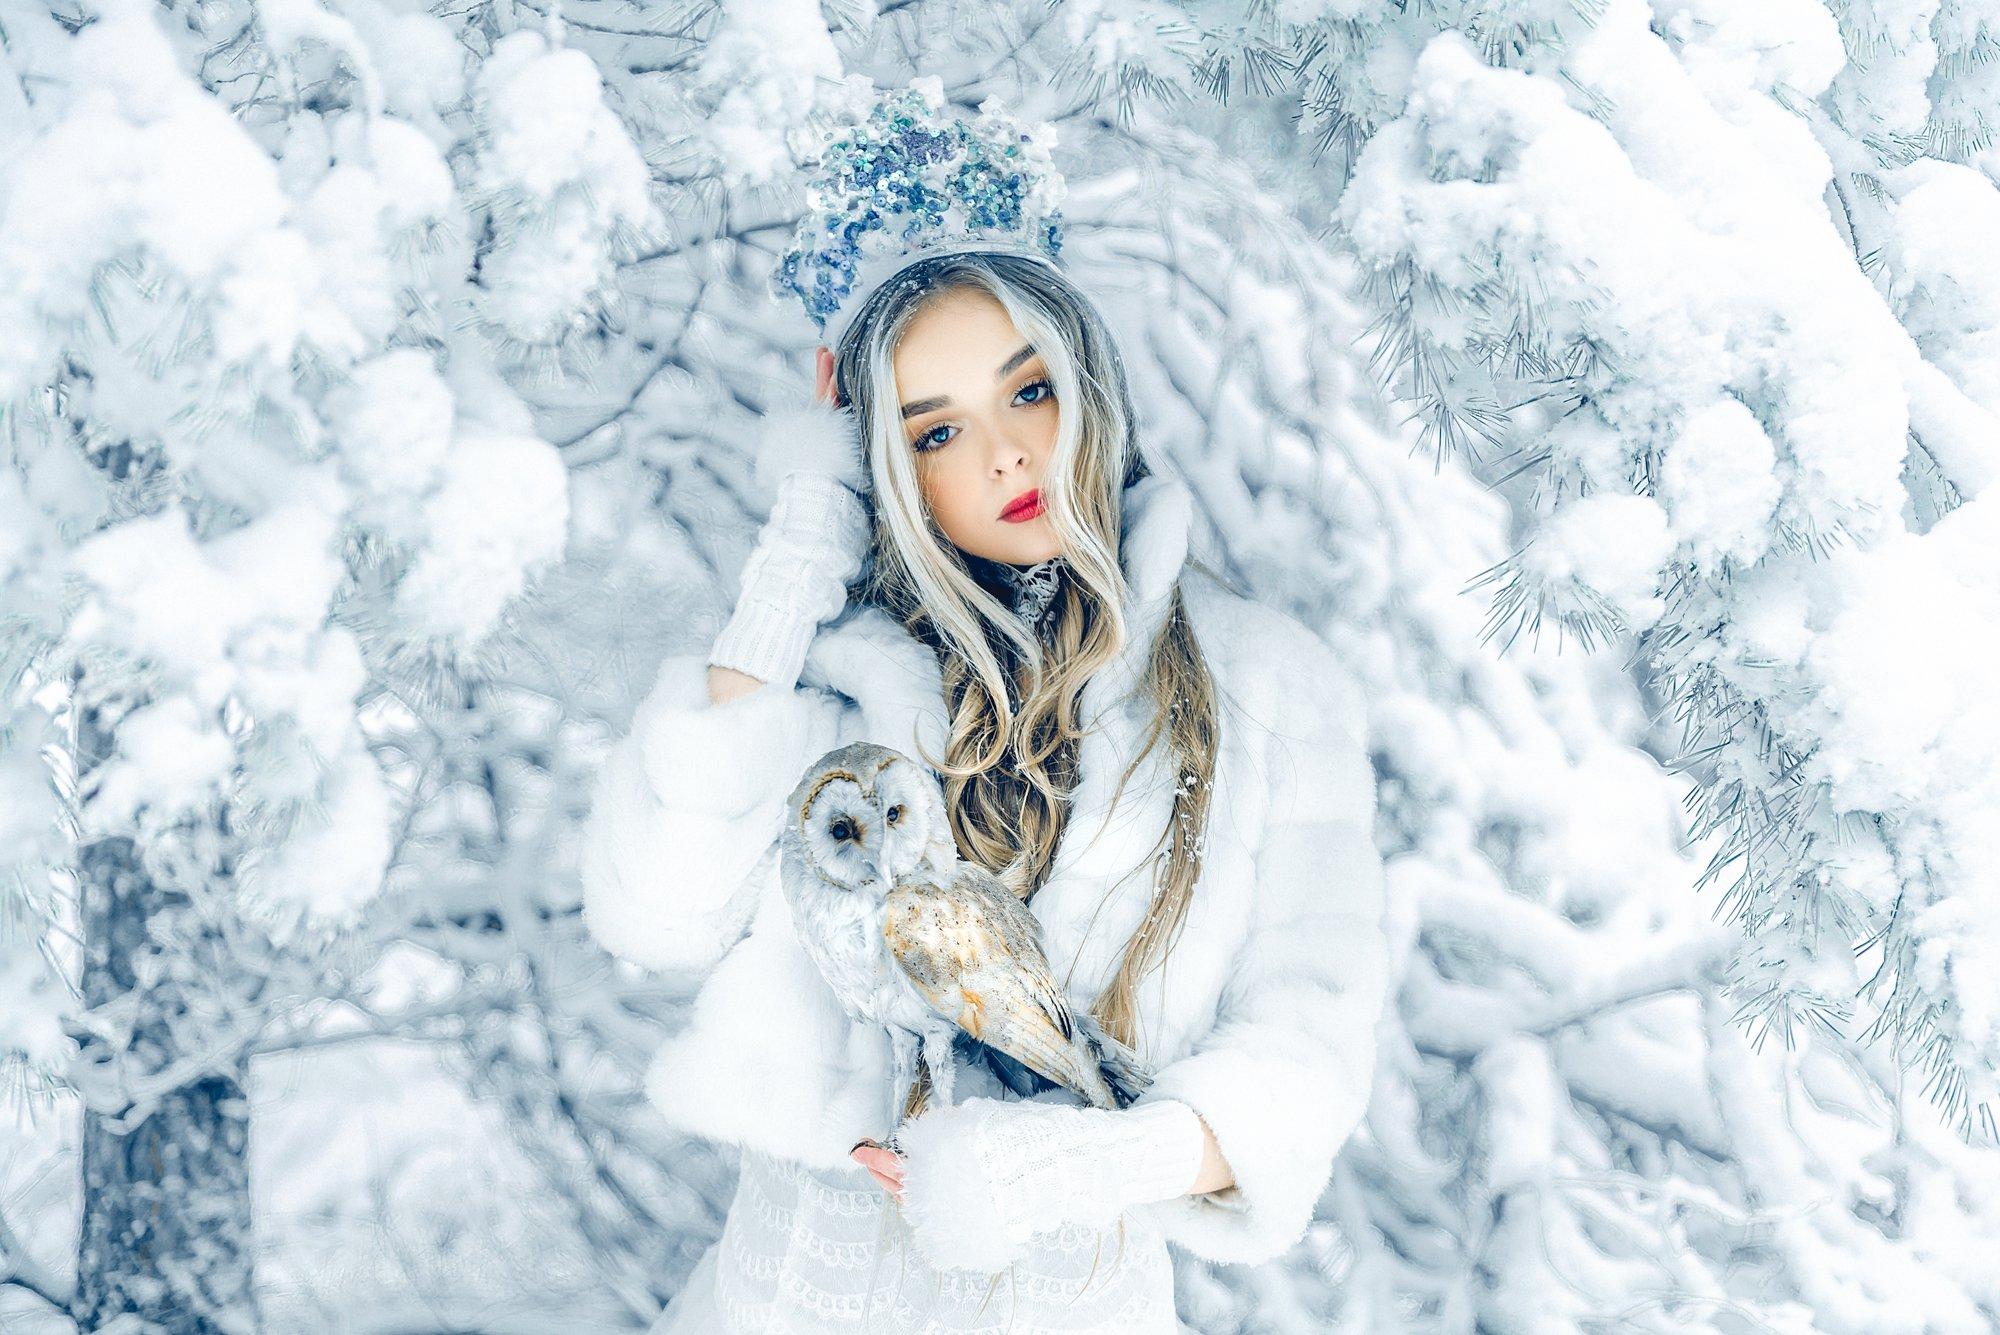 woman, portrait, conceptual, outdoors, winter, beauty, Руслан Болгов (Axe)